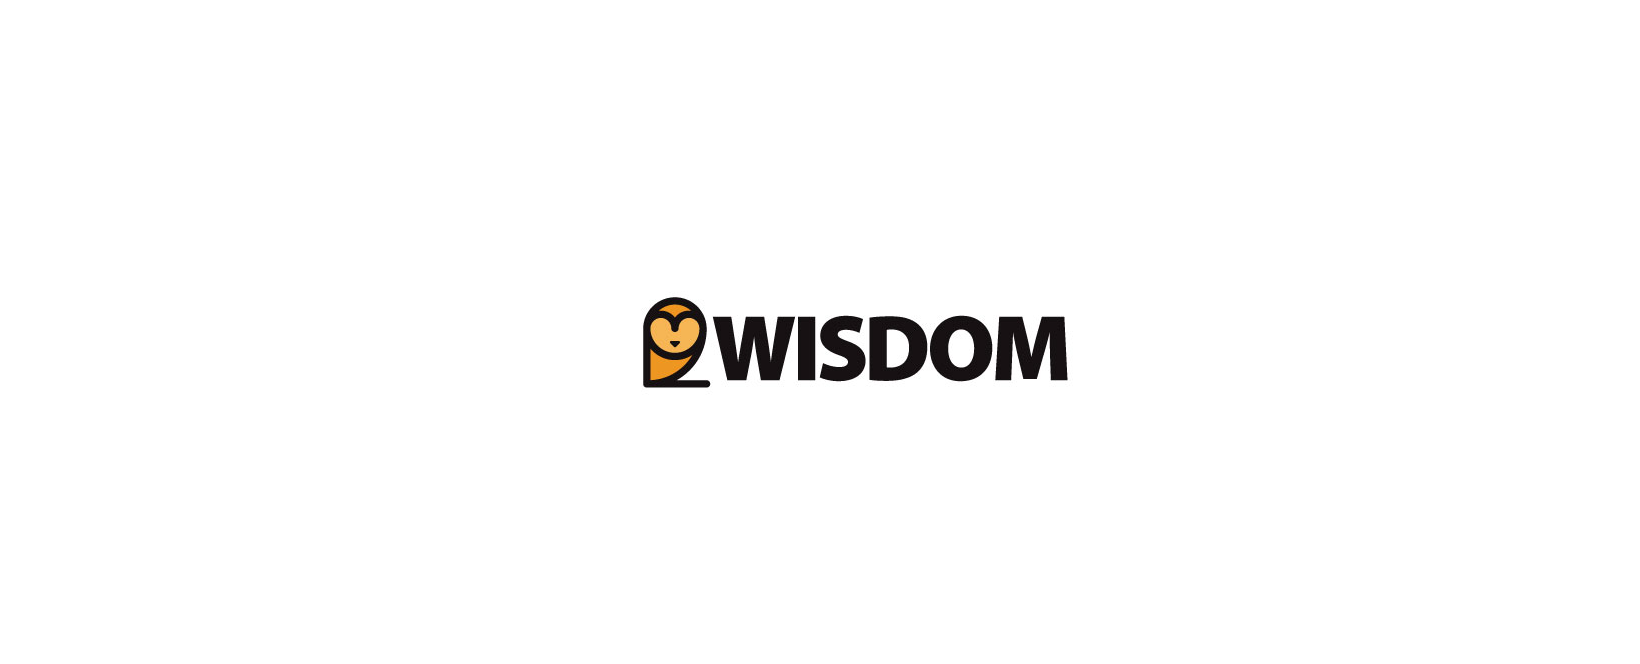 Wisdom Discount Code 2021